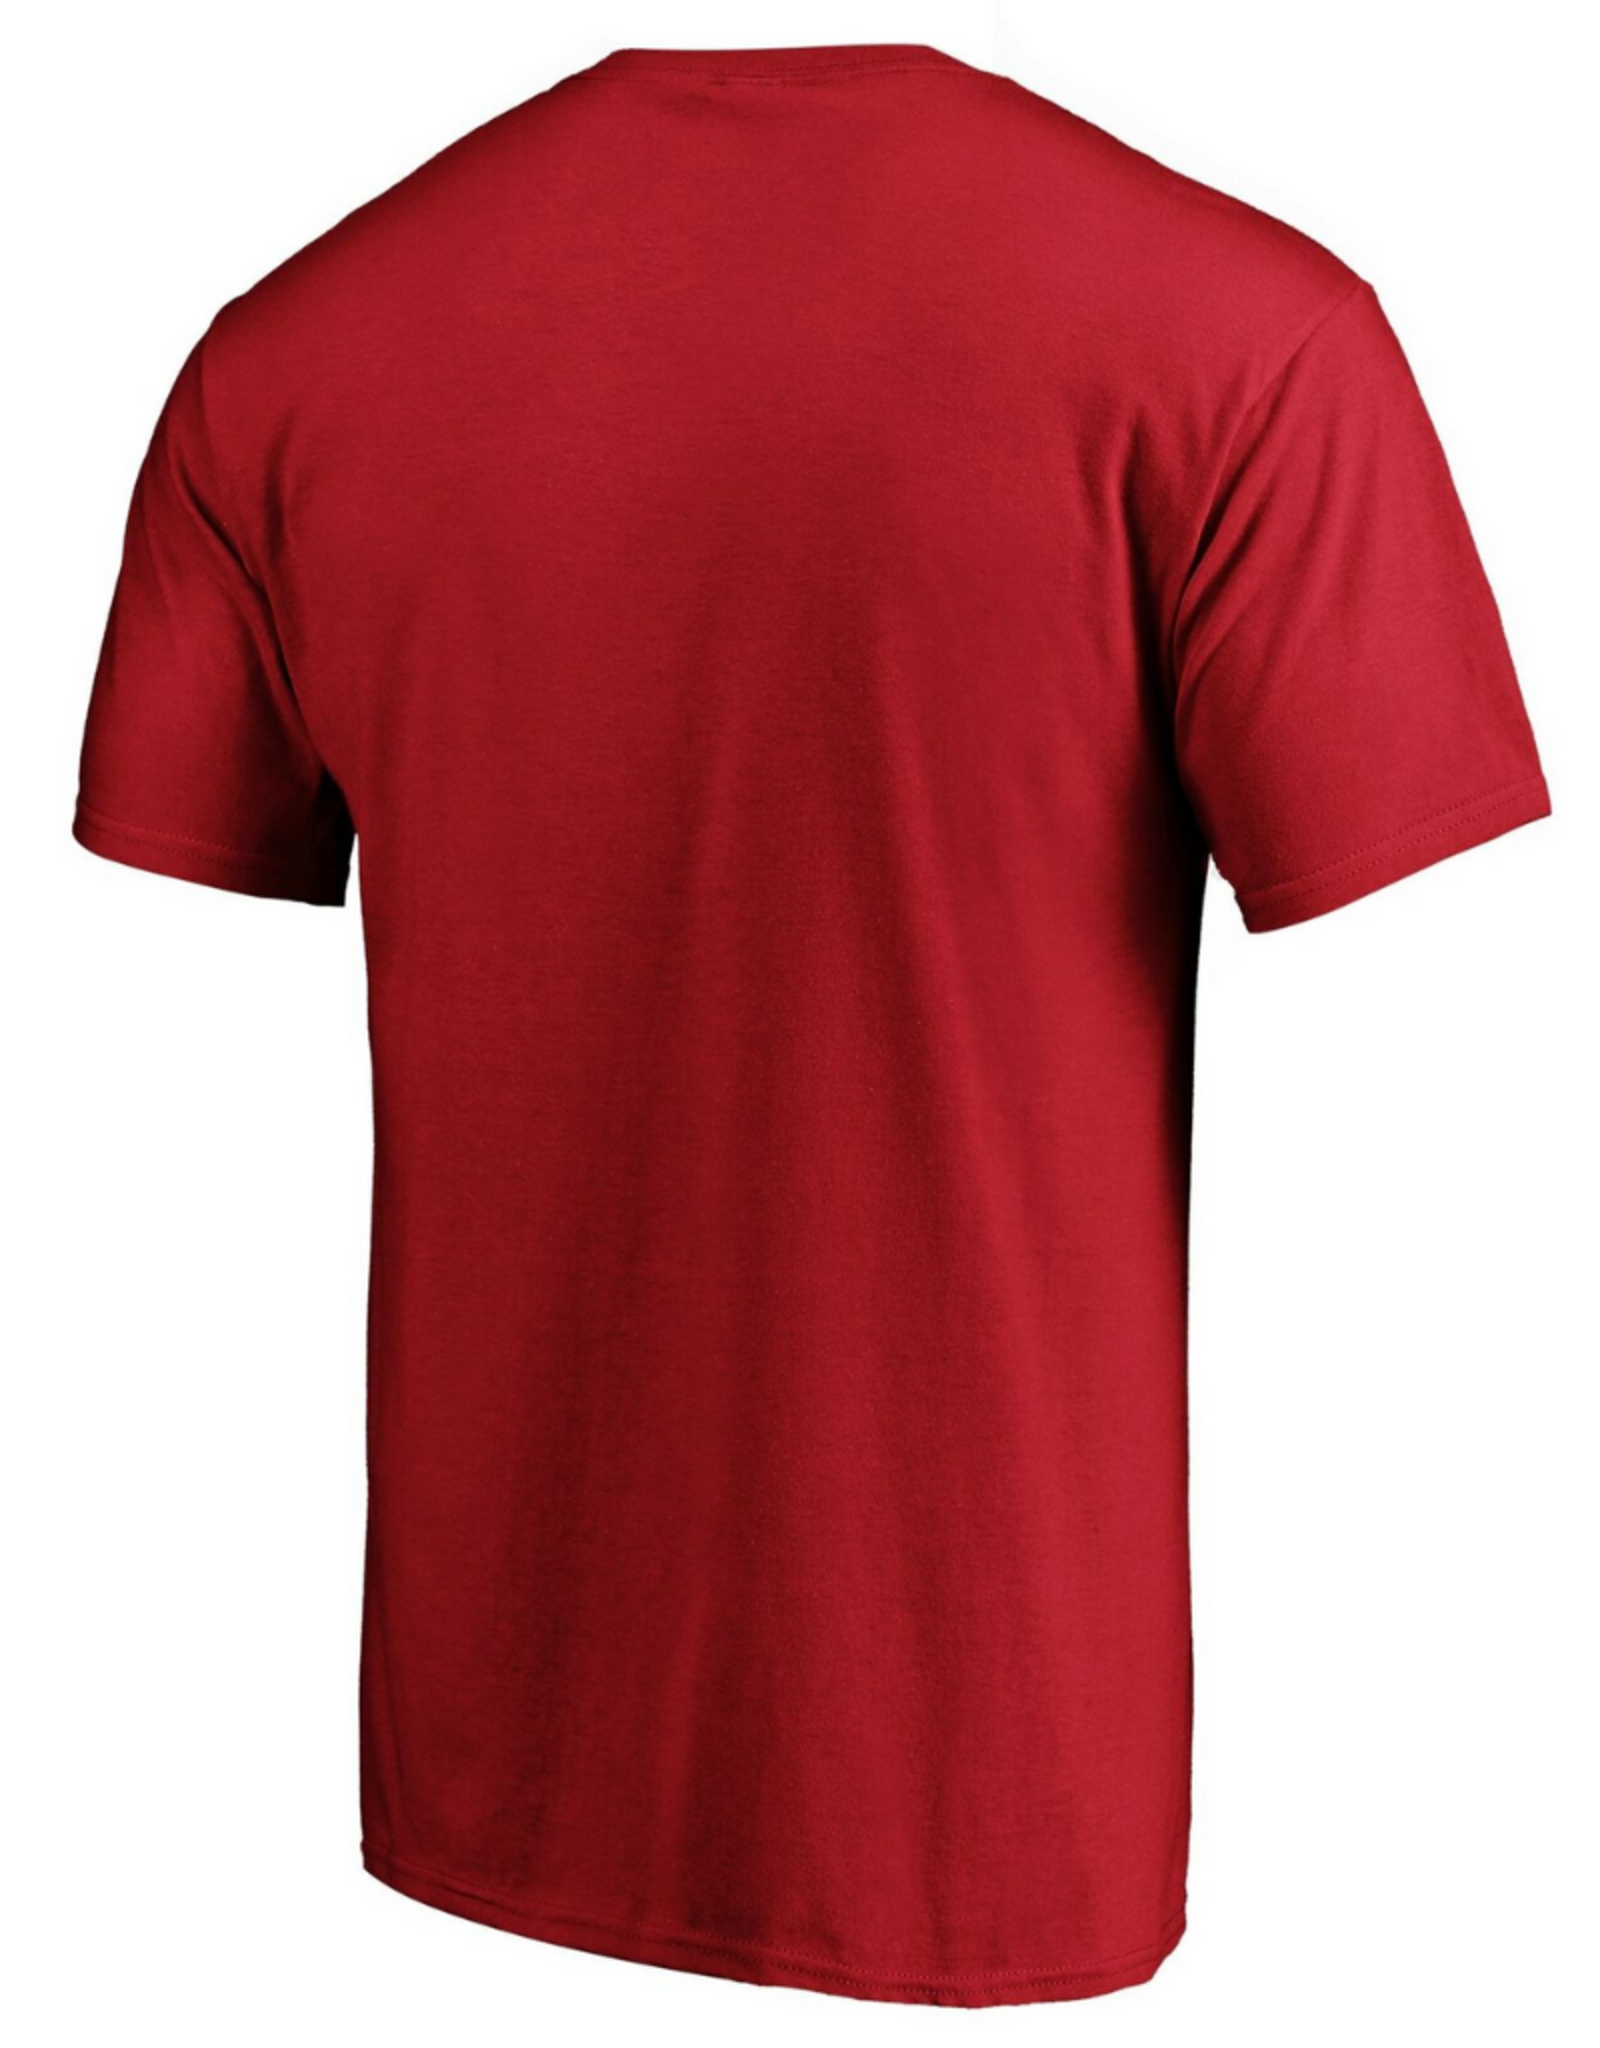 Fanatics Fanatics Men's Authentic Pro Rinkside Prime Montreal Canadiens T-Shirt Red